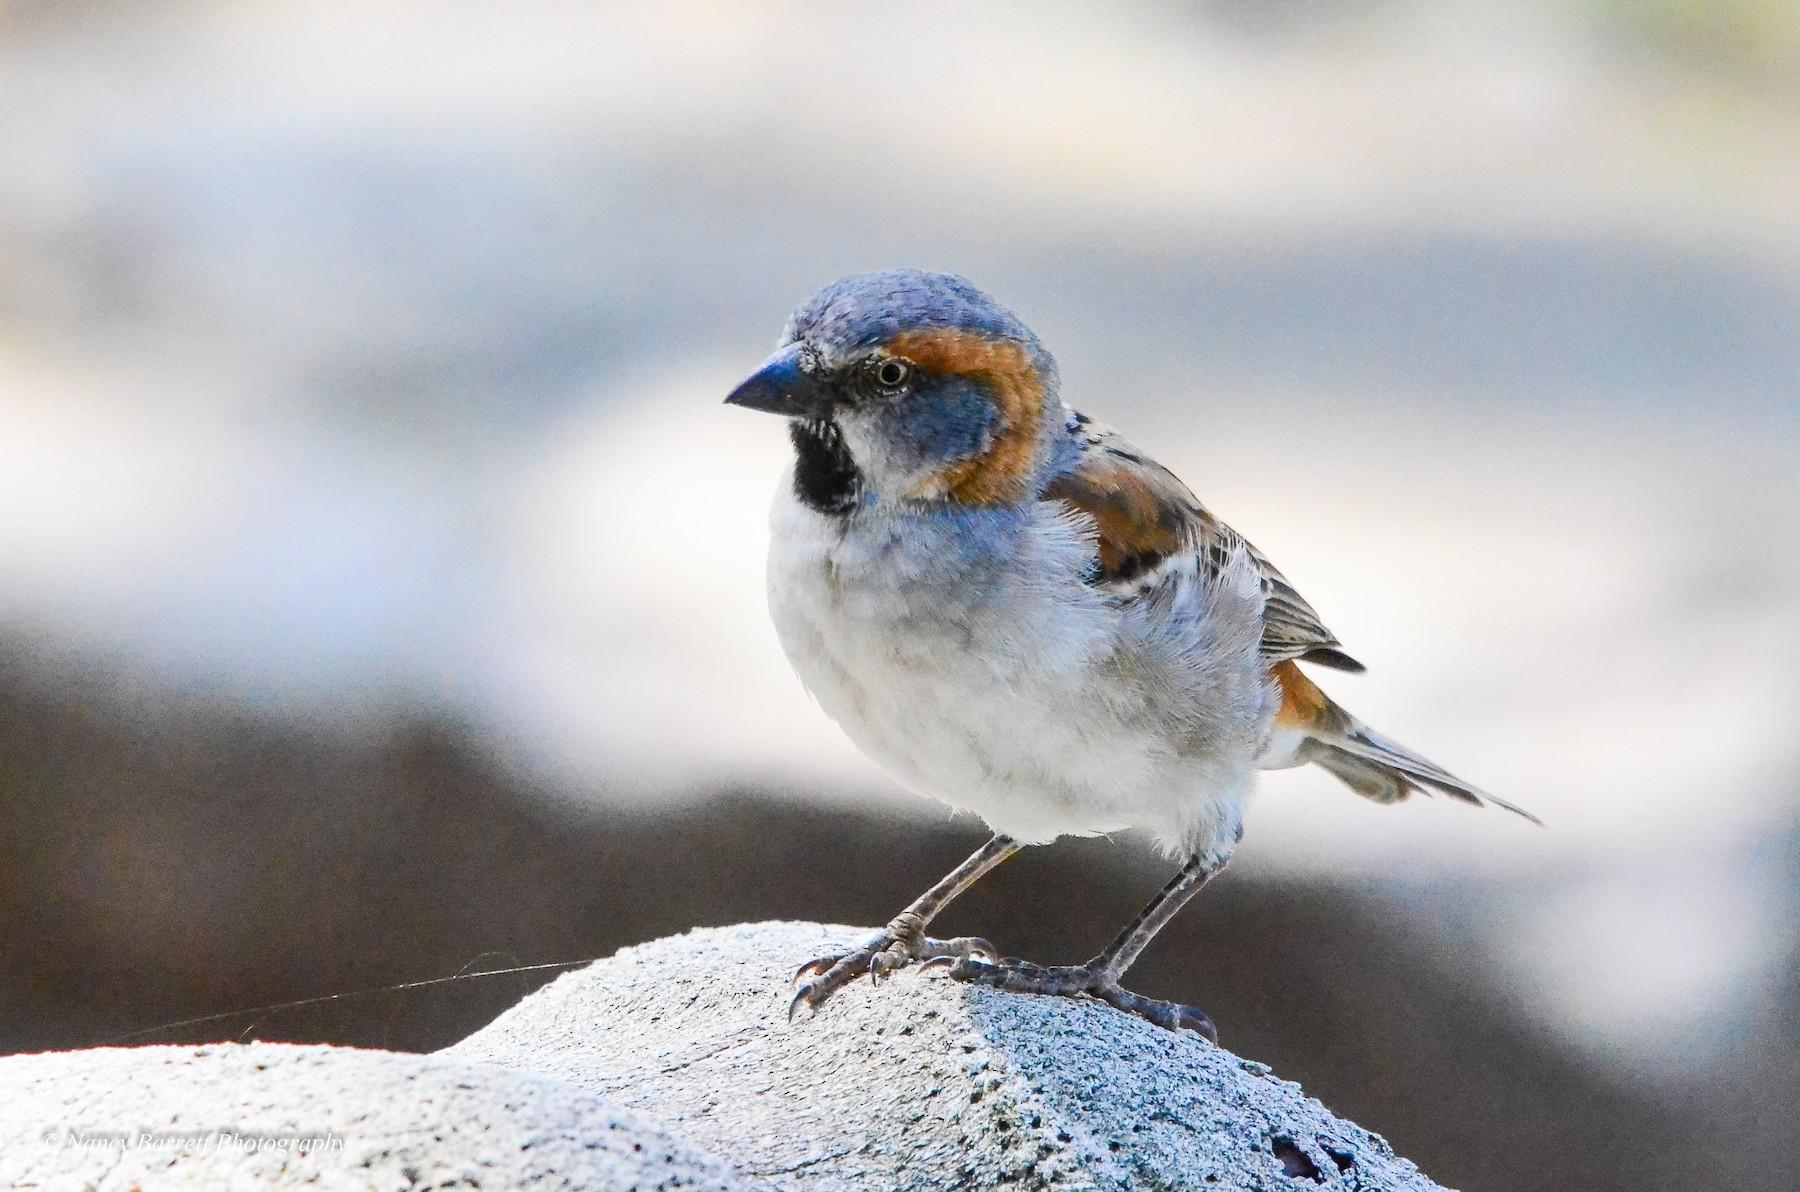 Kenya Rufous Sparrow - Nancy Barrett